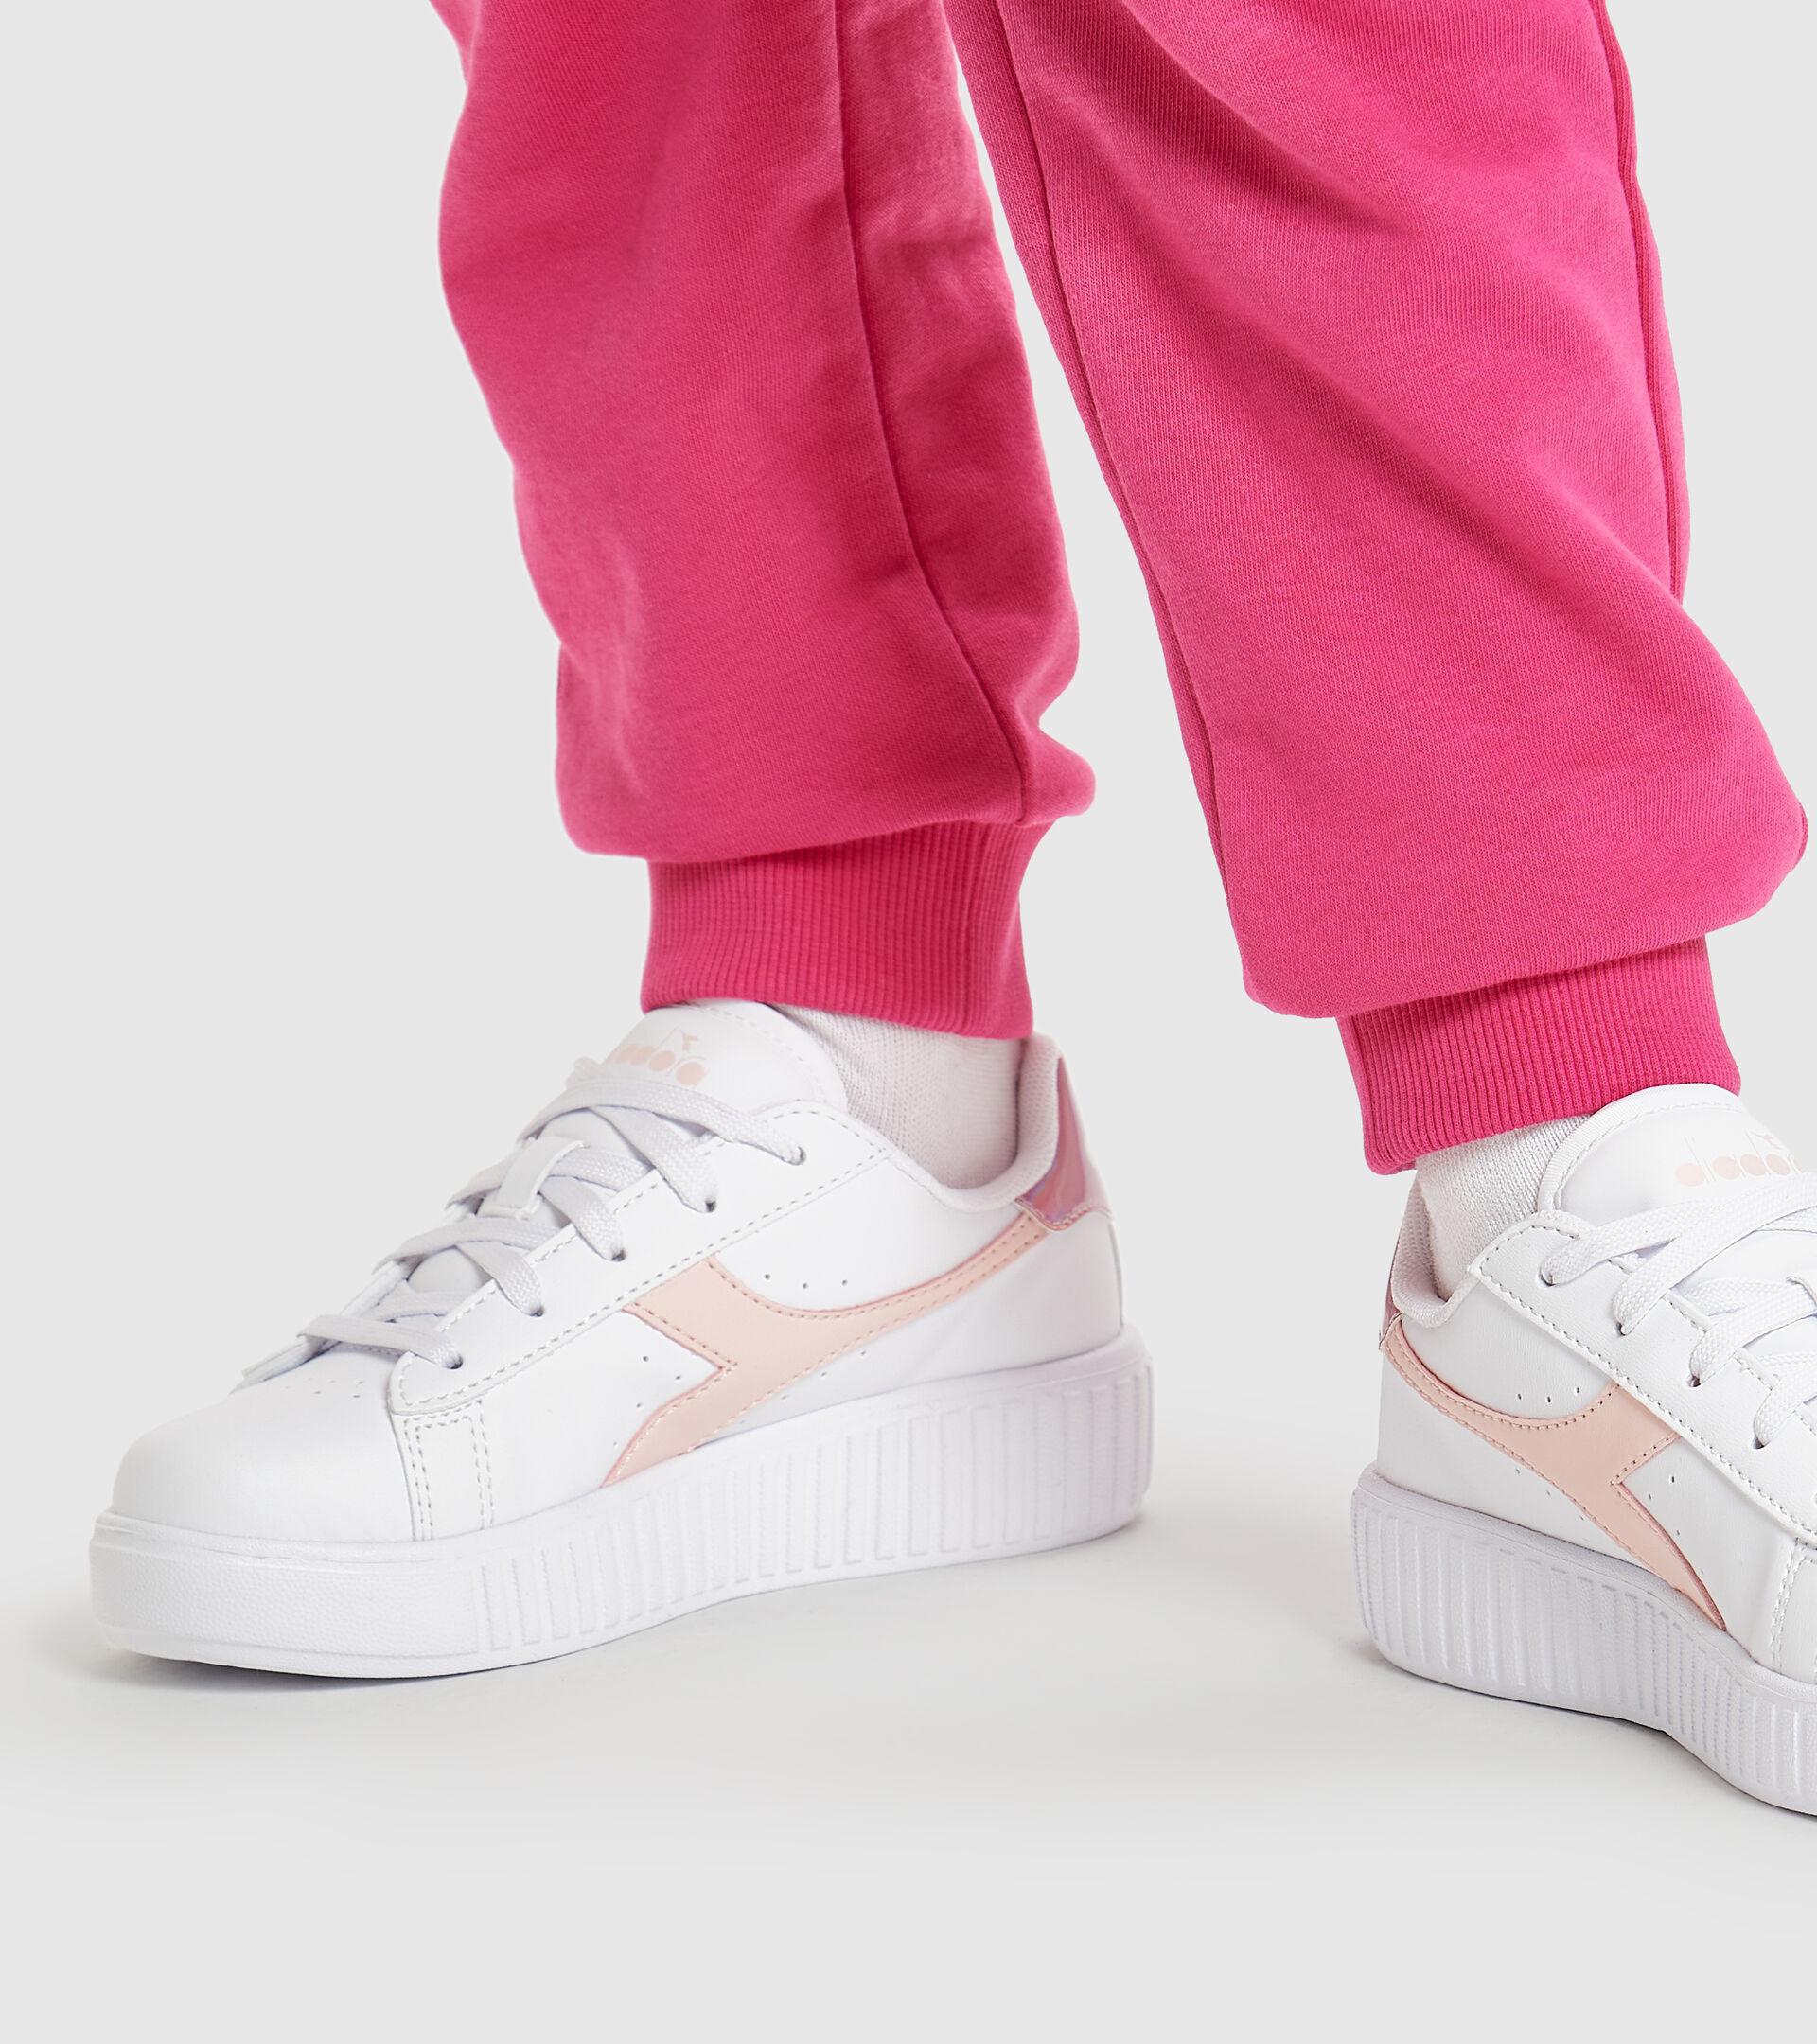 Sportschuh - Kinder 4-8 Jahre GAME STEP PS WEISS/VERSCHLEIERT ROSA - Diadora